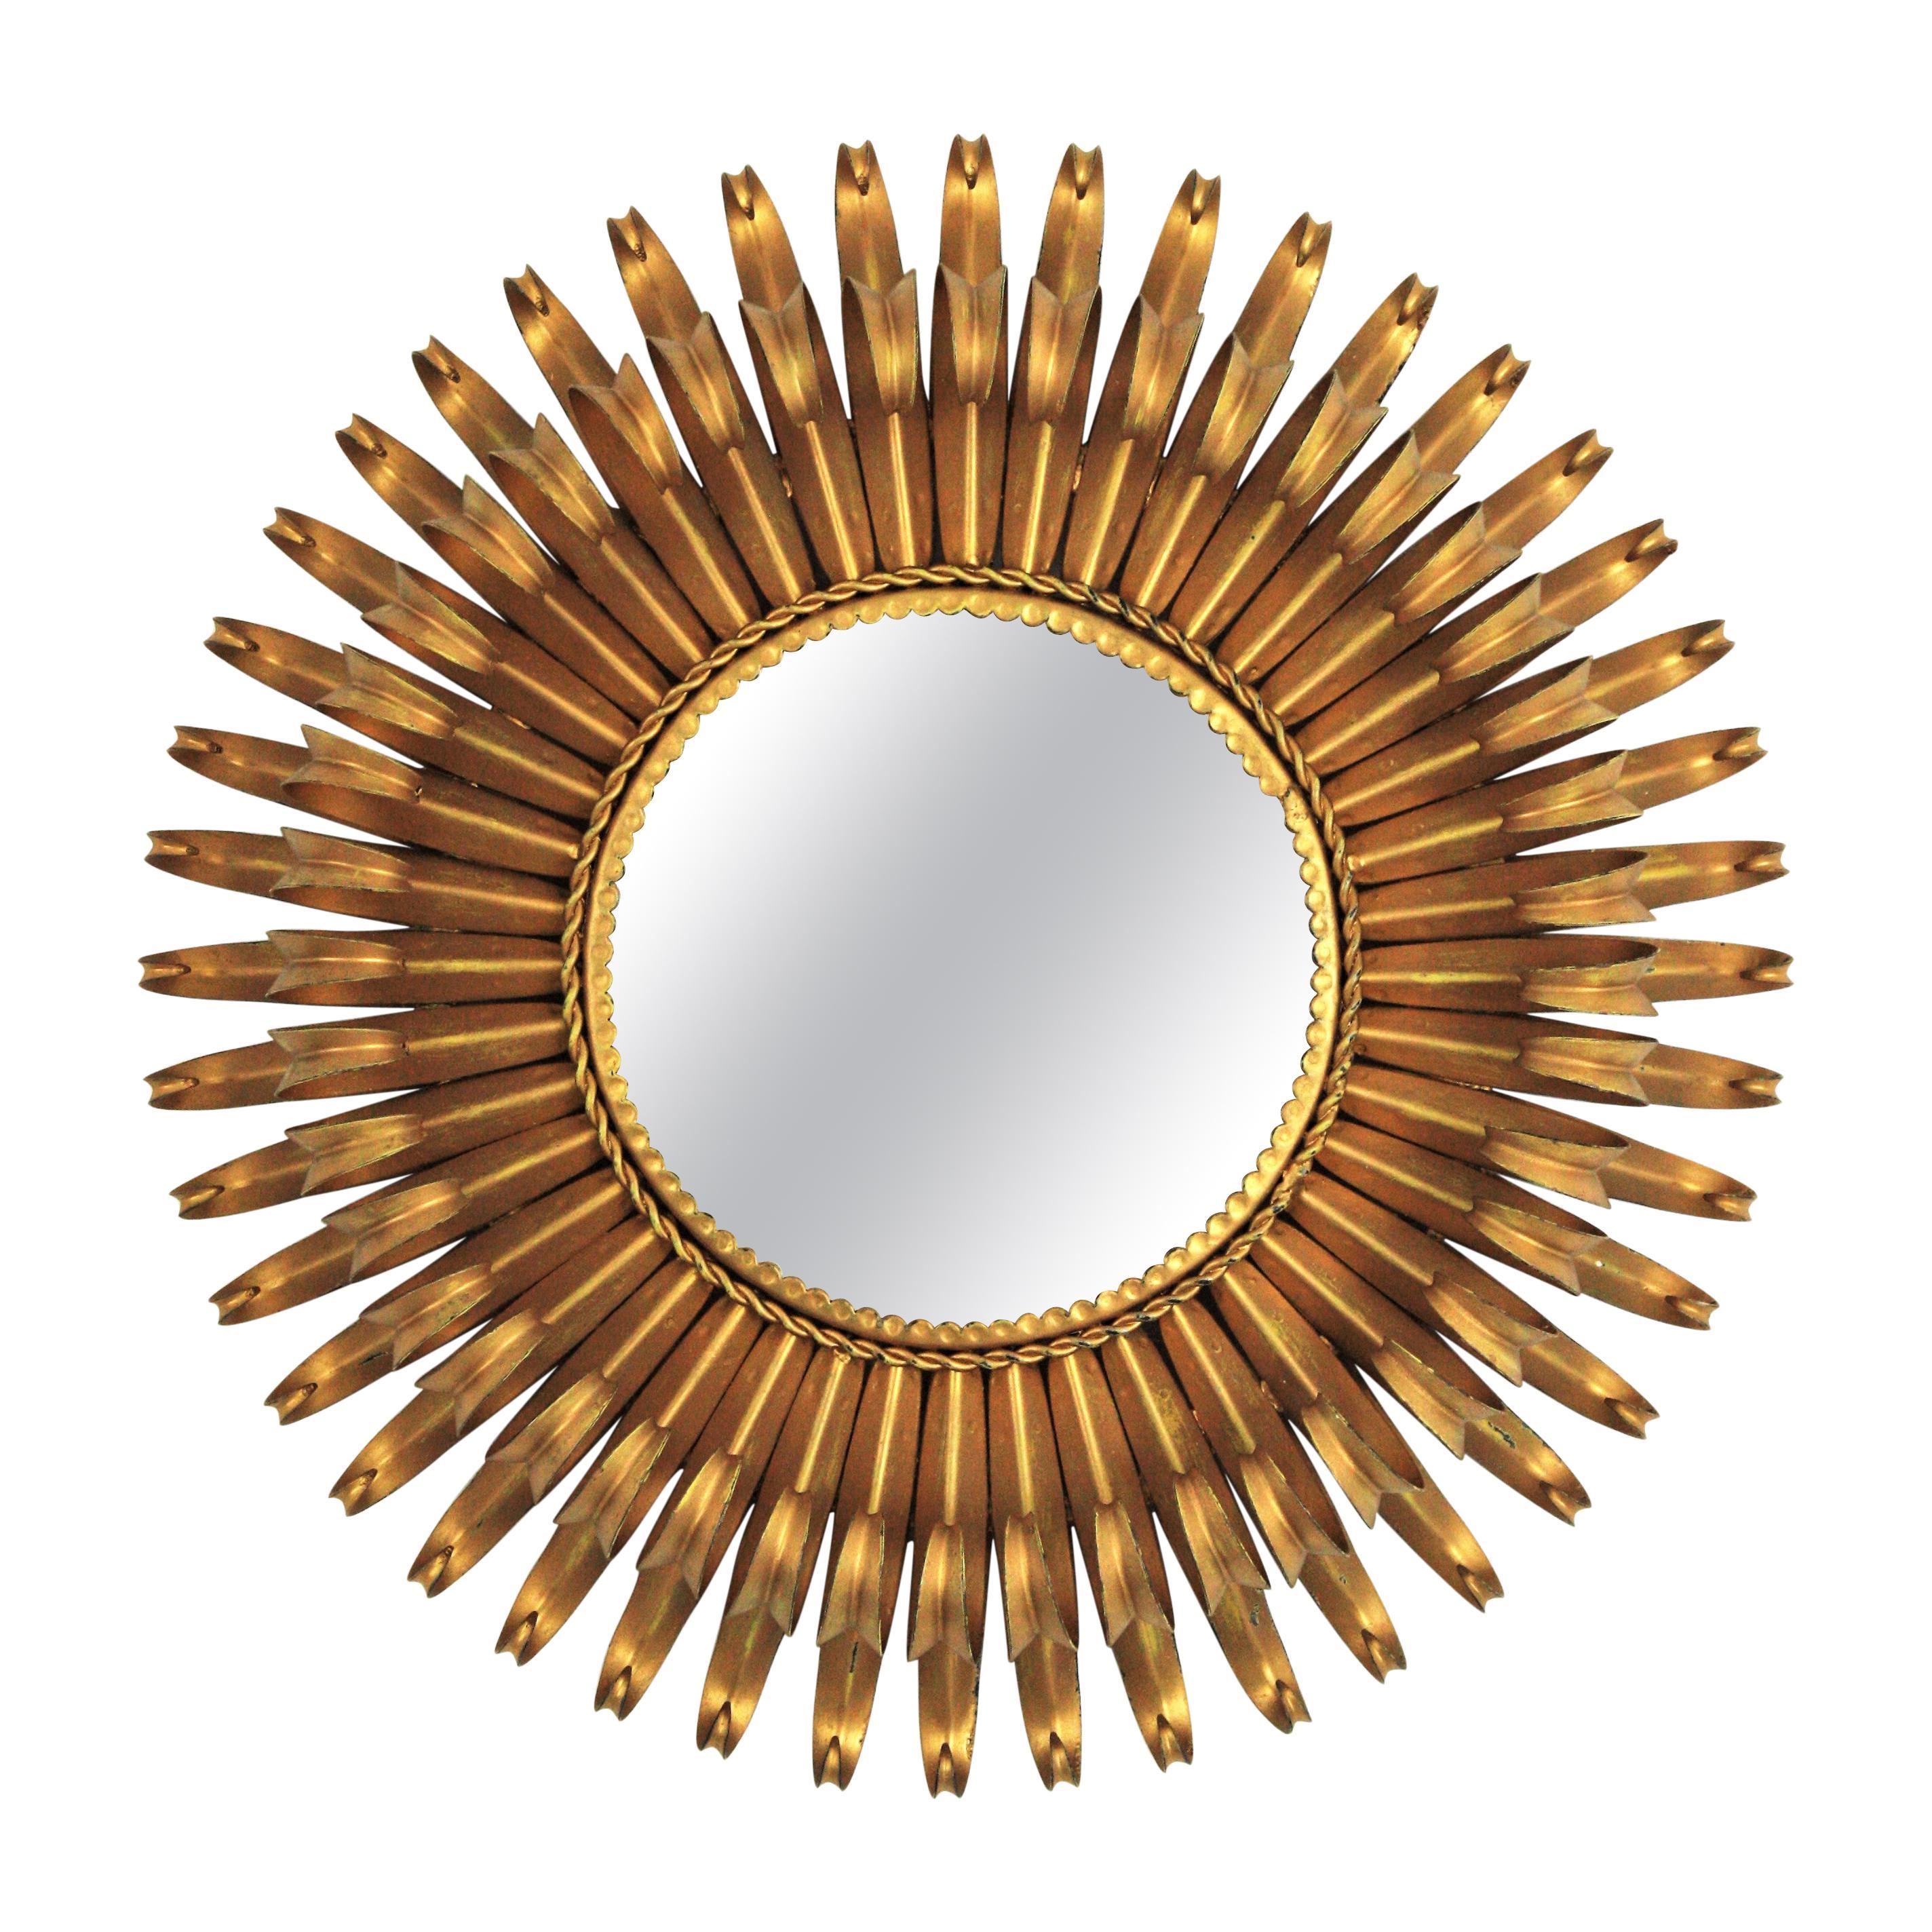 Sunburst Eyelash Mirror in Gilt Wrought Iron